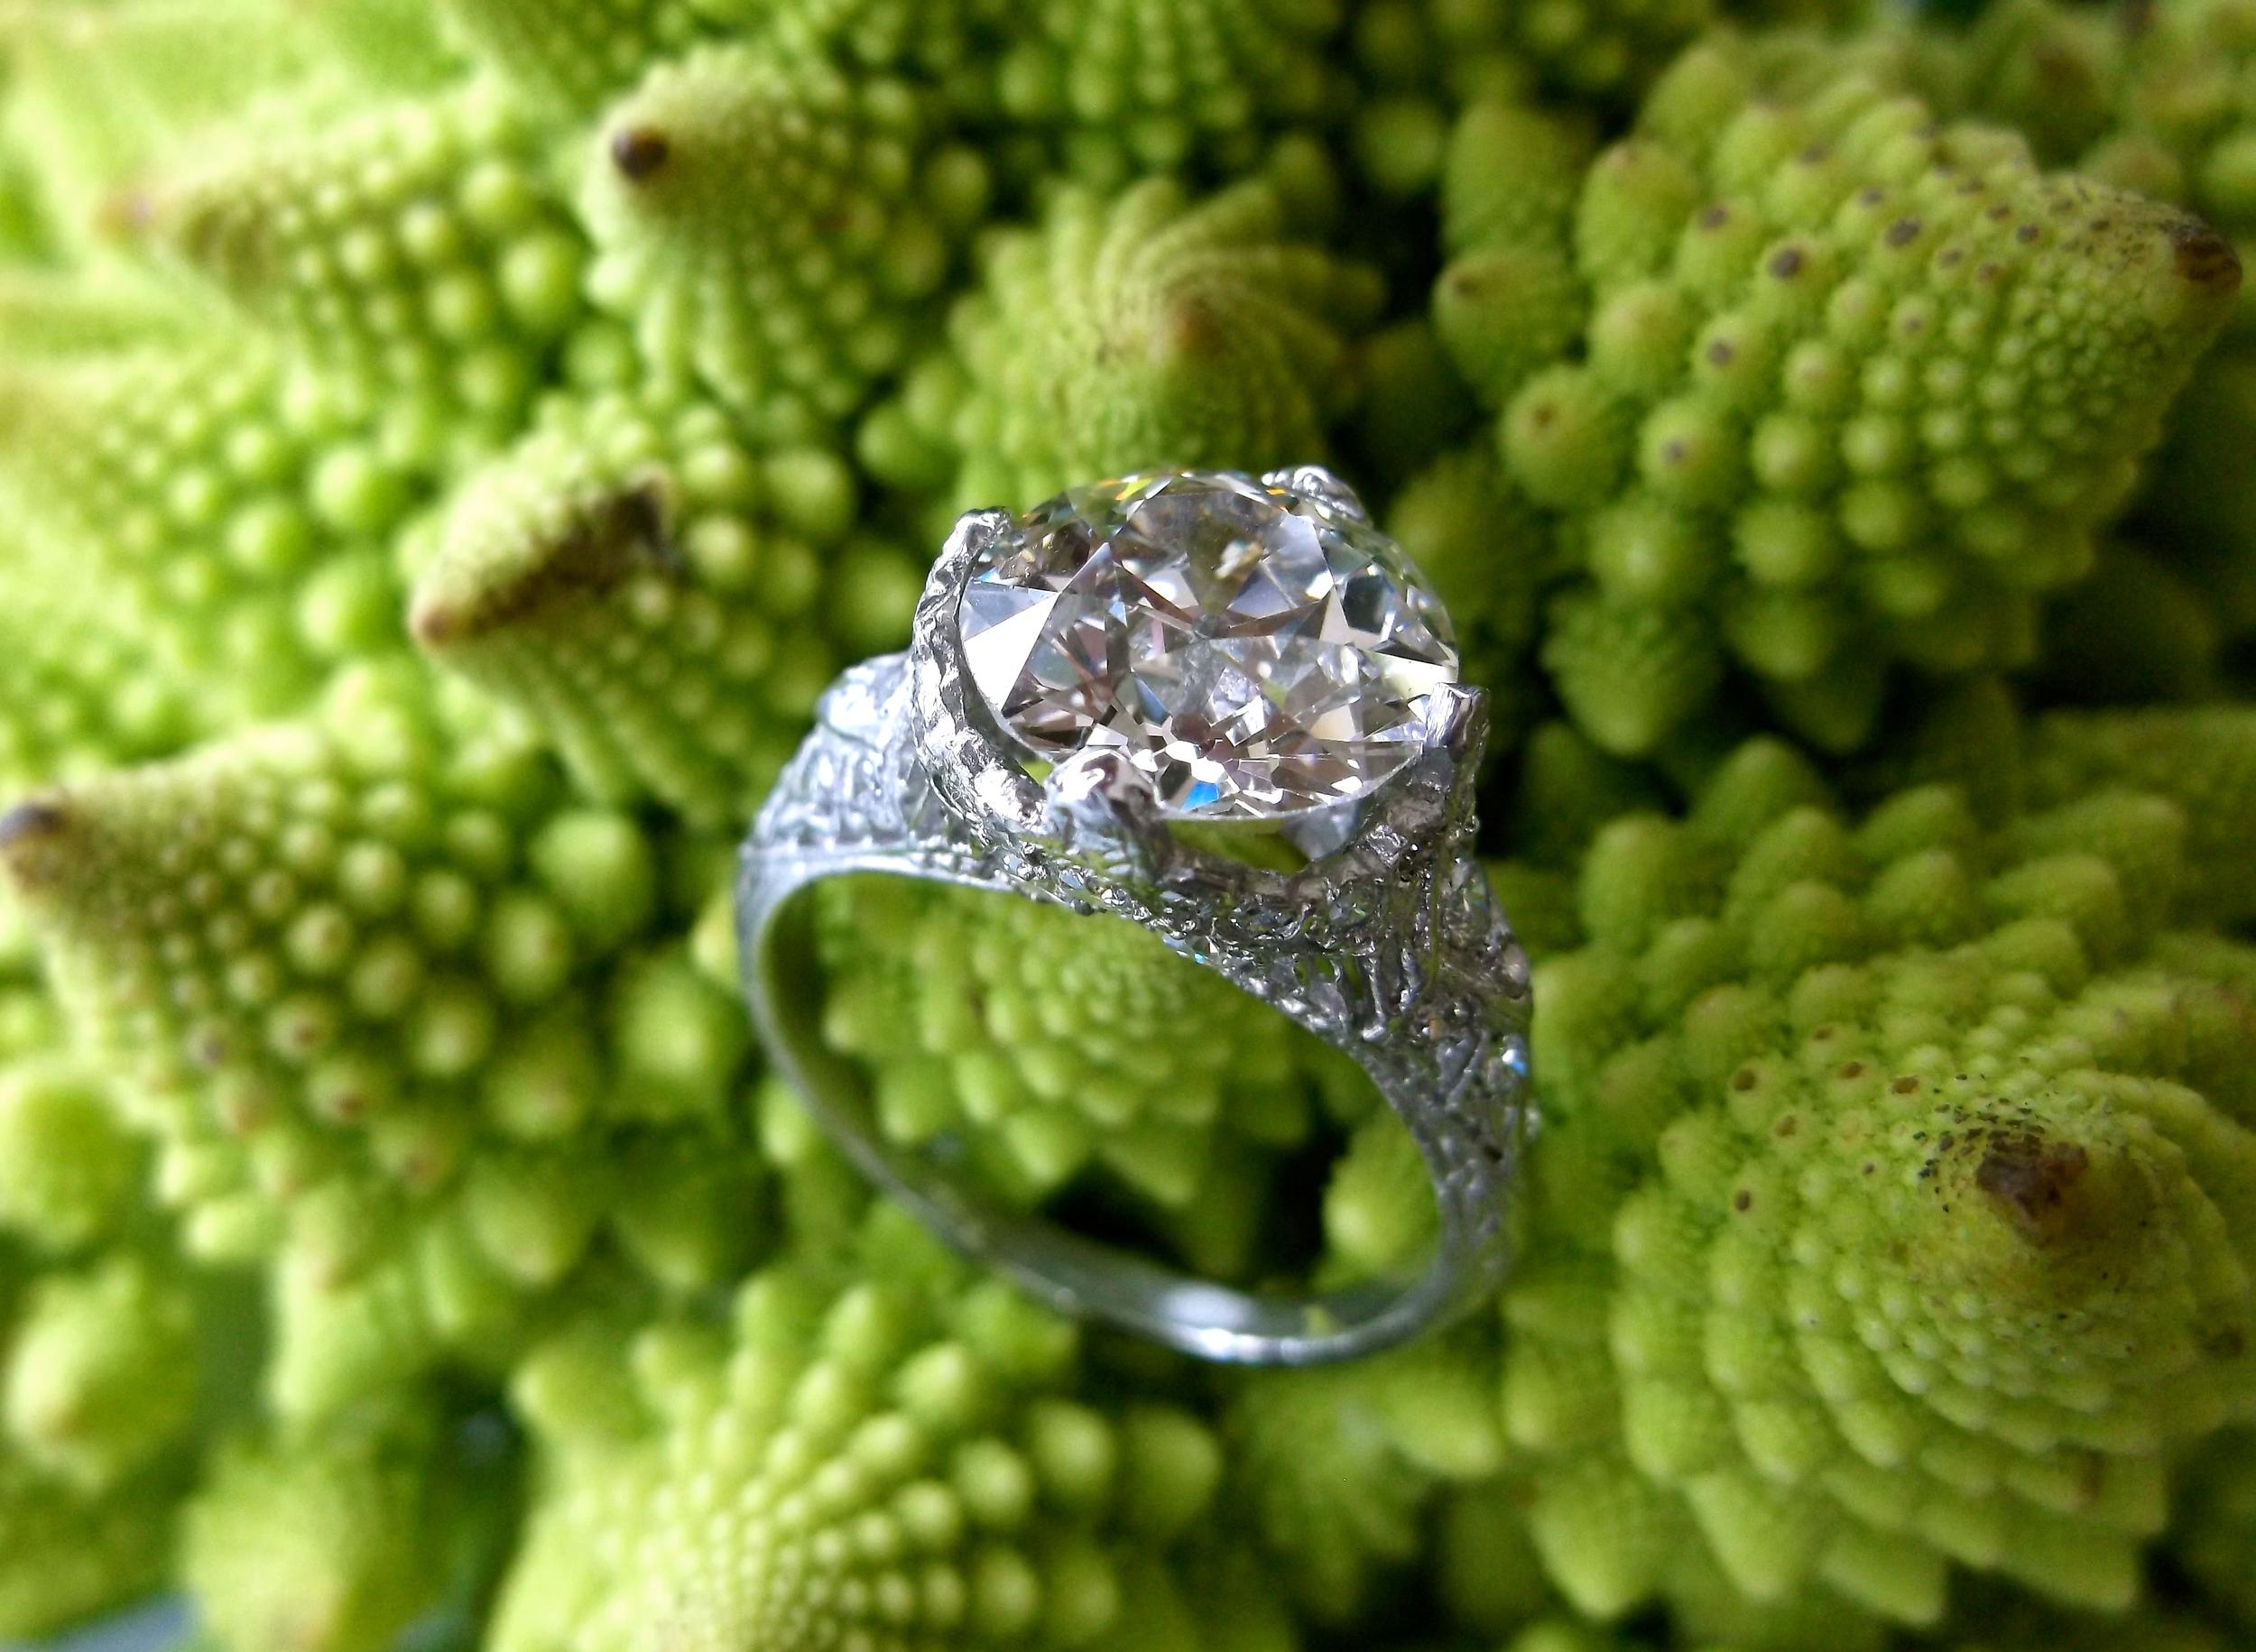 SOLD - Breathtaking 3.09 carat Old European cut diamond set in an Art Deco style platinum and diamond mounting.